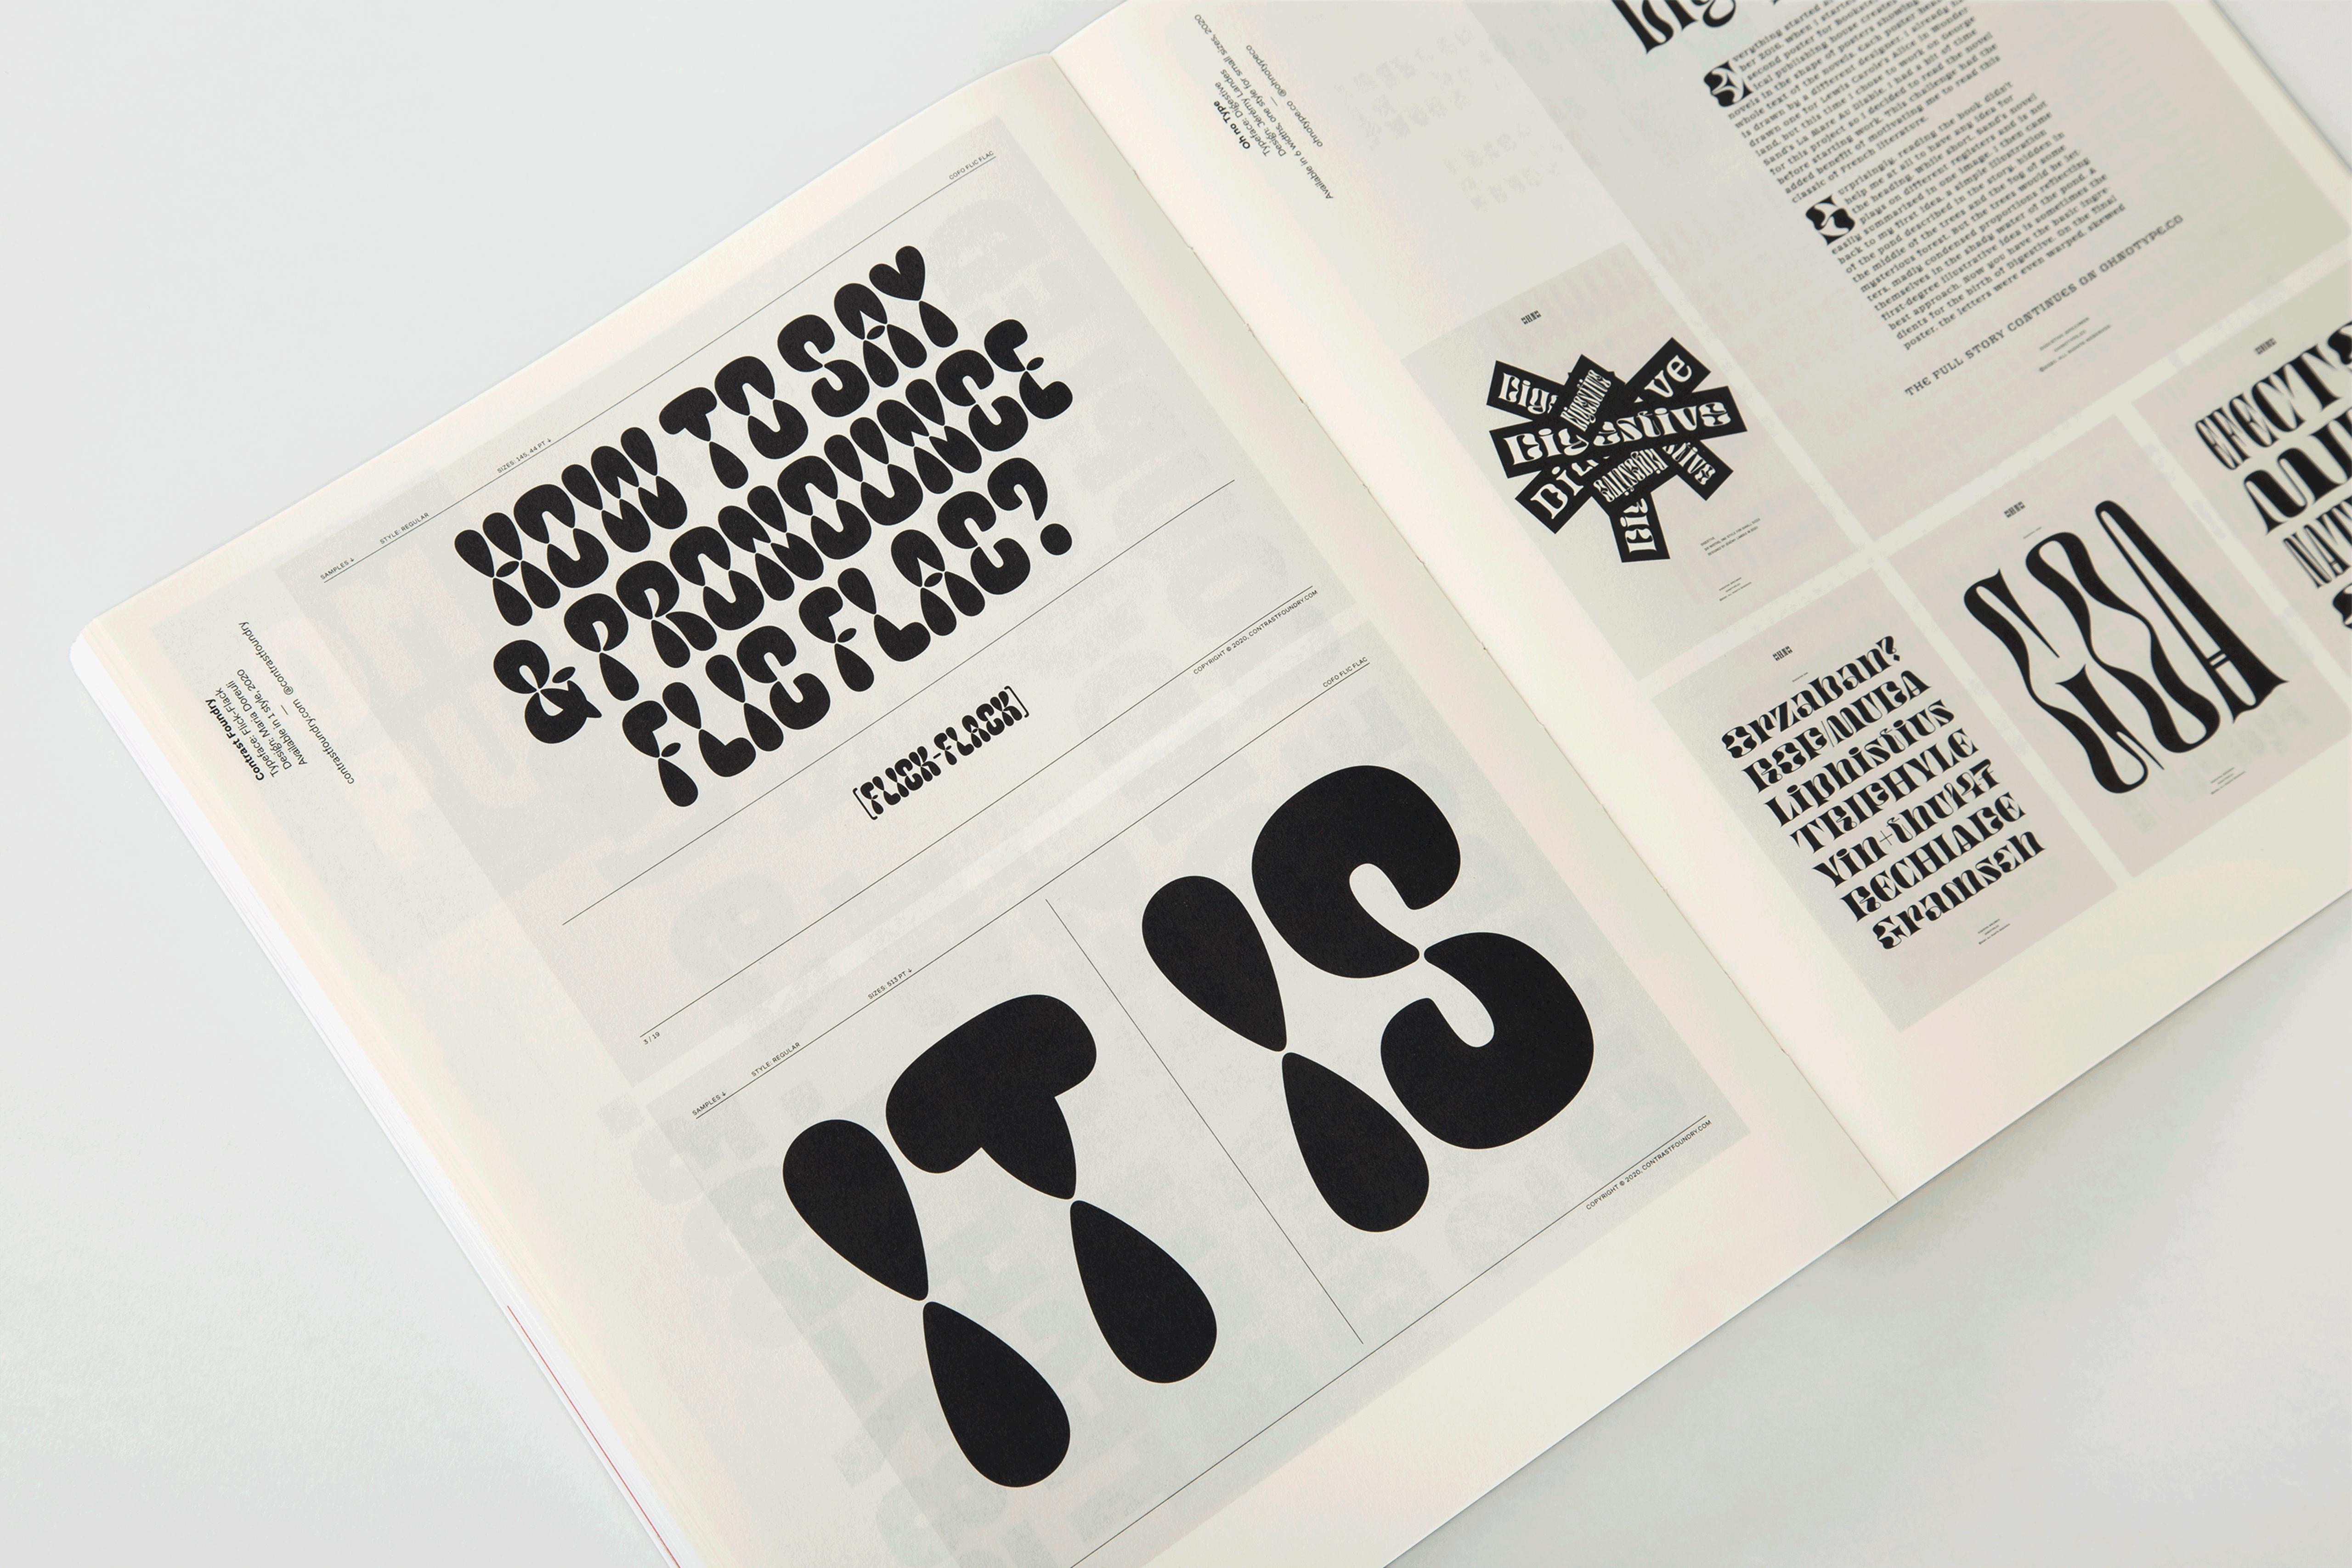 Slanted-Publiaktionen-Slanted-Publishers-Support-Independent-Type_32